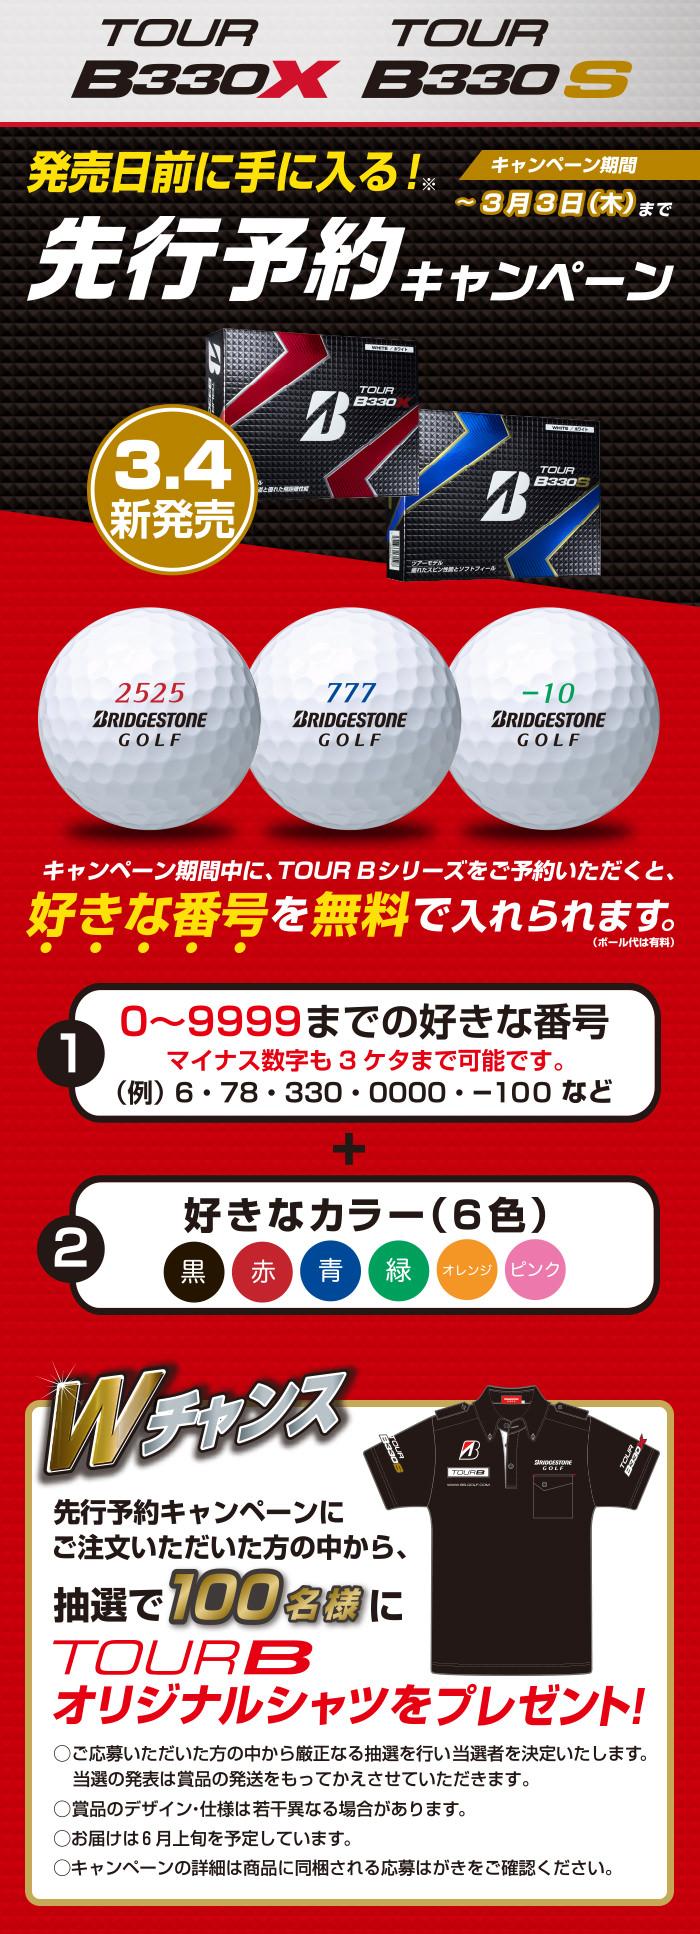 『BRIDGESTONE GOLF TOUR B330シリーズ』先行予約キャンペーン